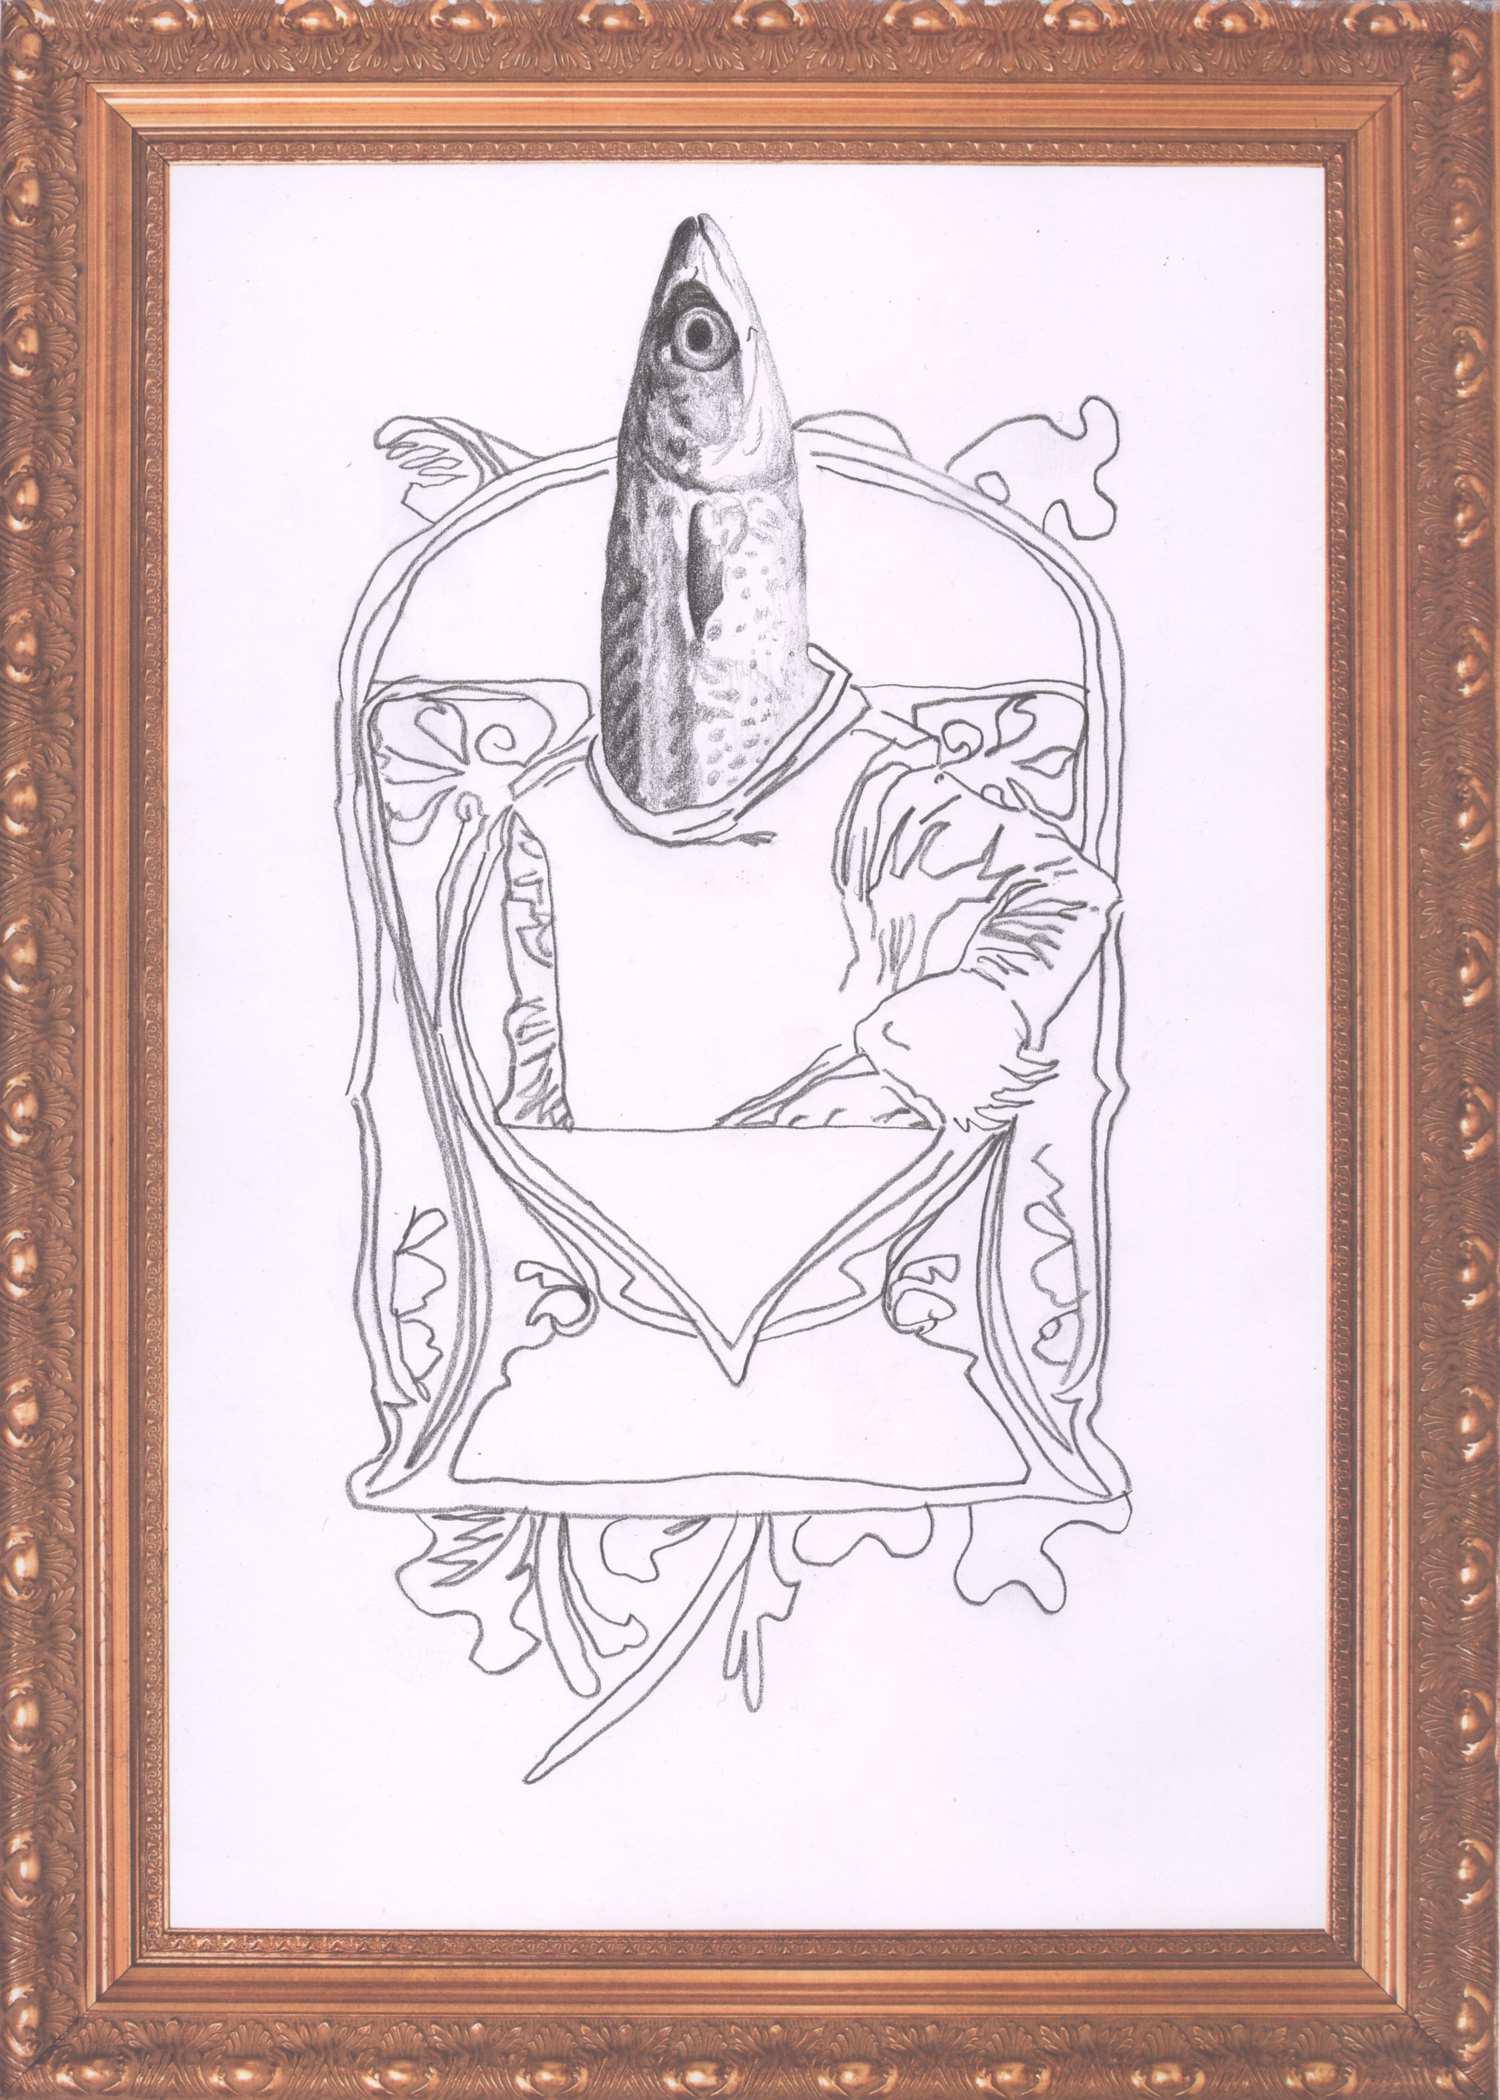 o.T. #03  2018, 29,7 x 21 cm, Graphit auf Papier